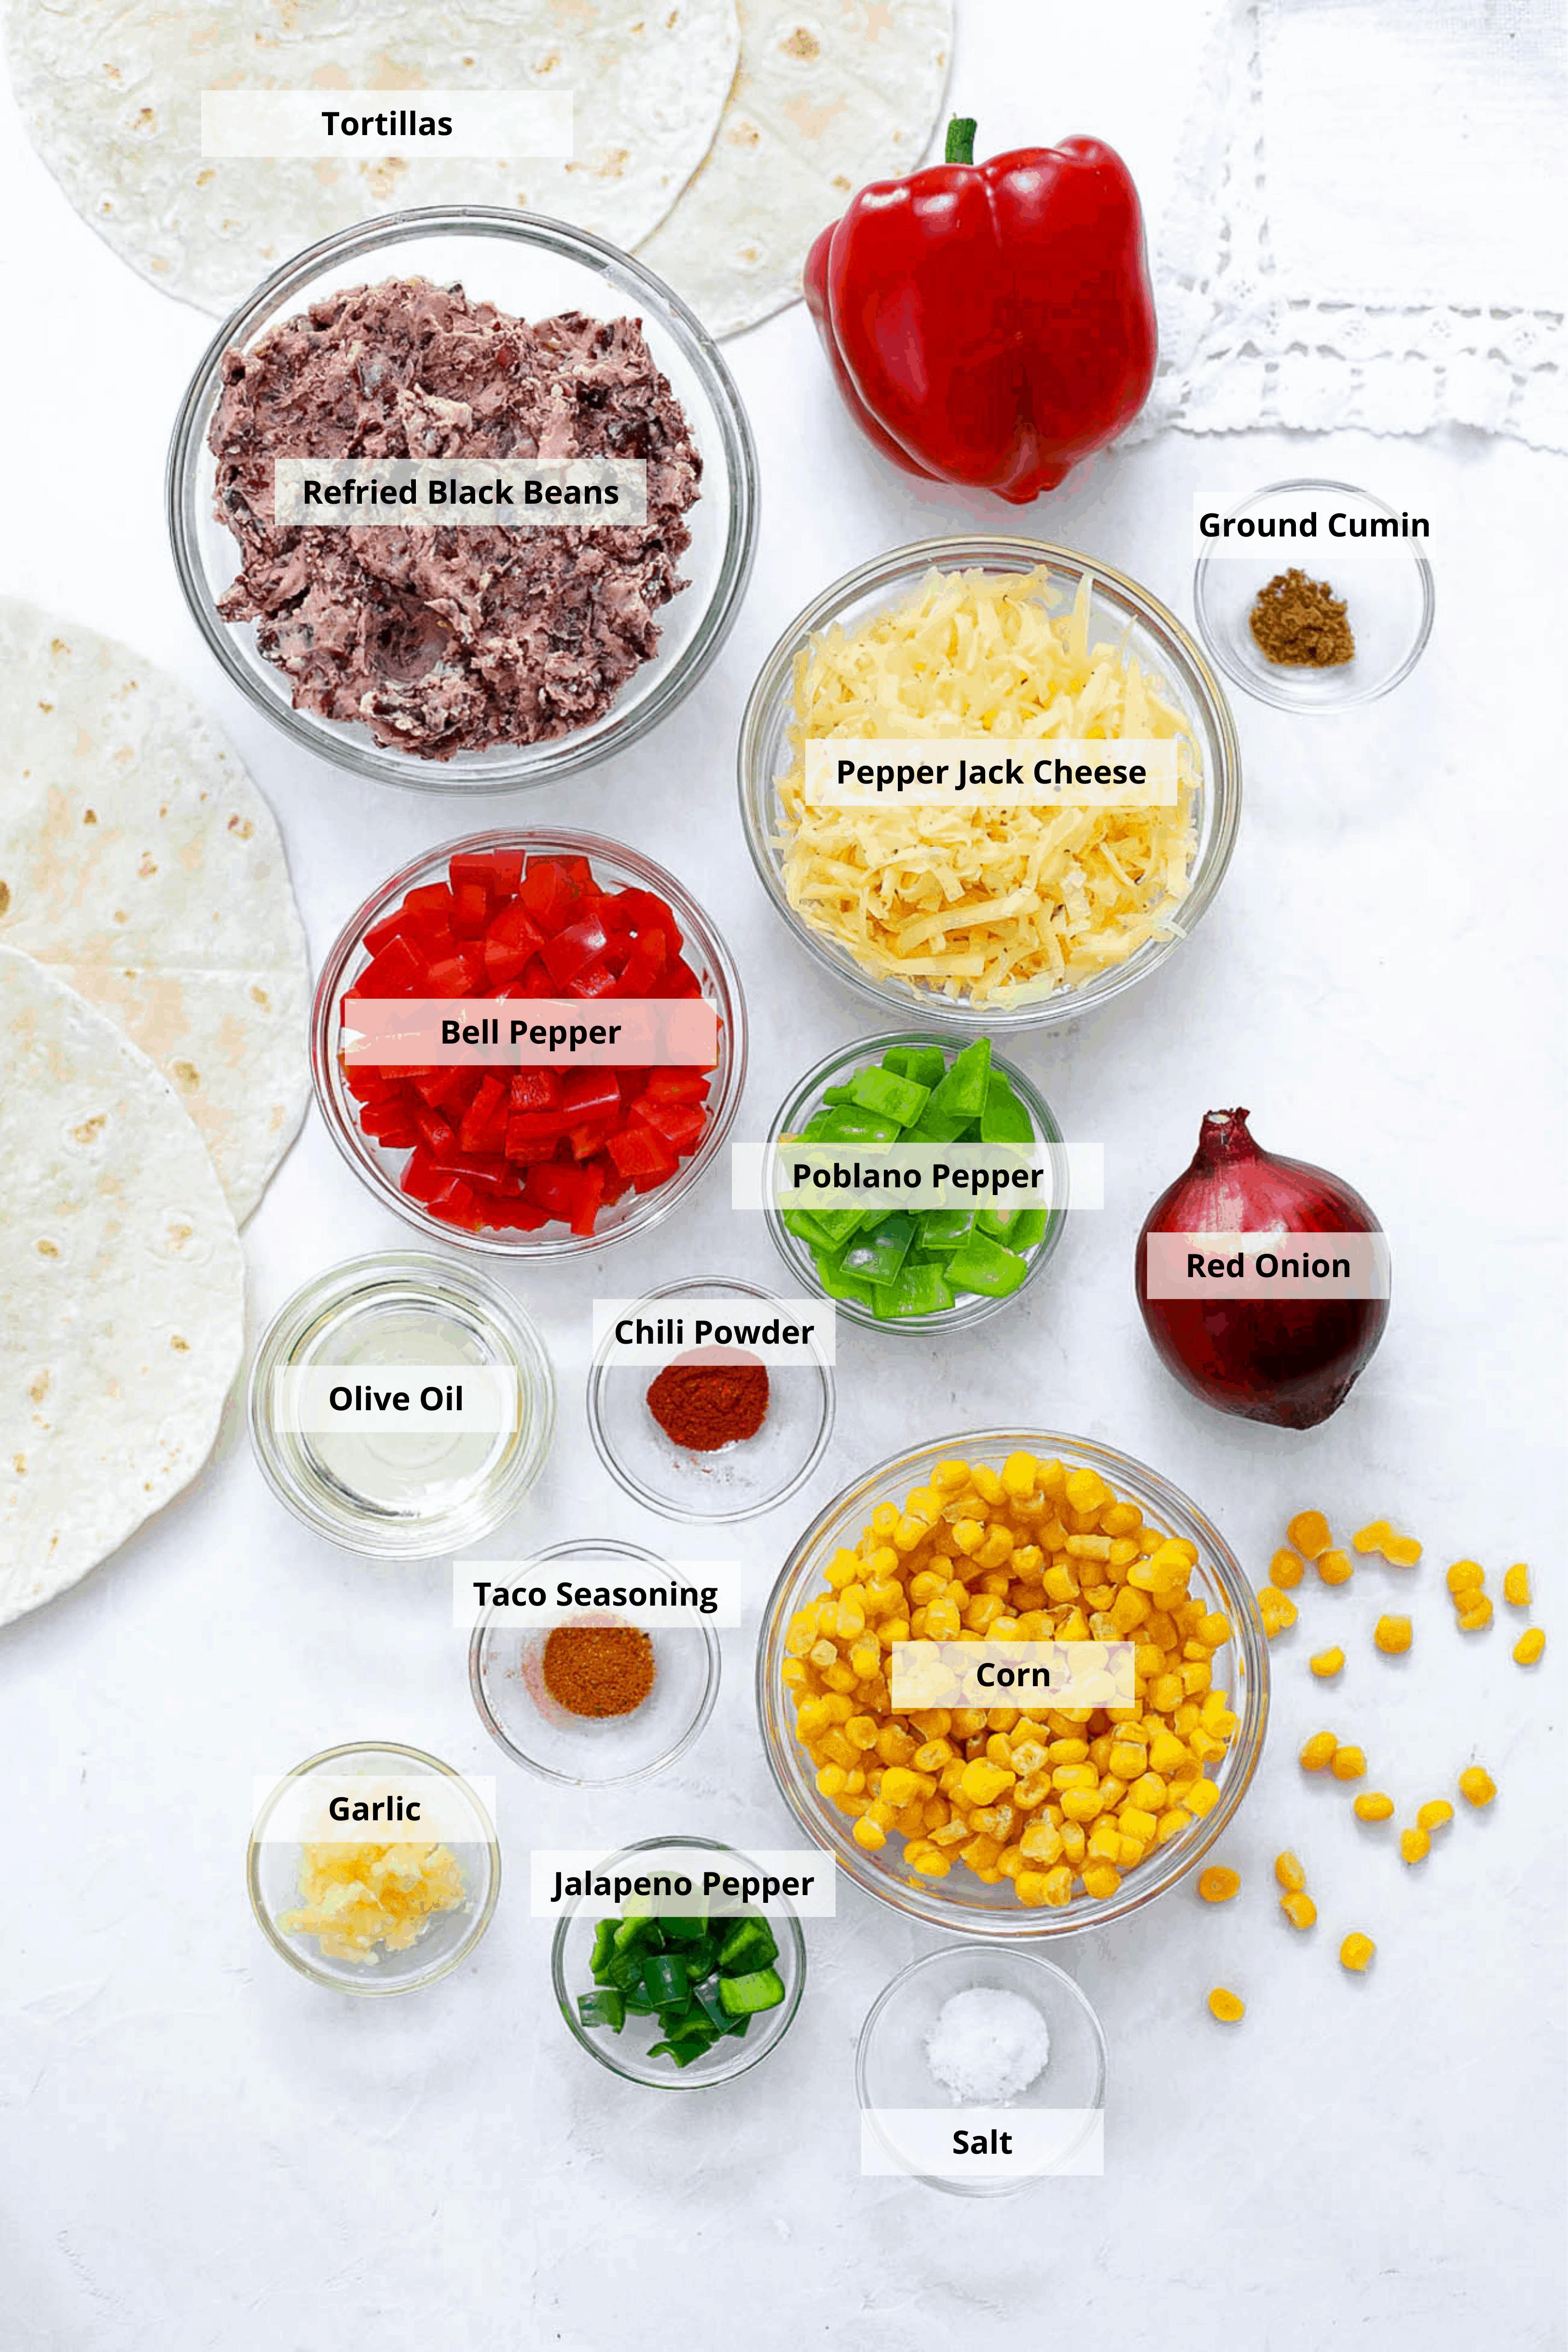 ingredients for black bean quesadillas